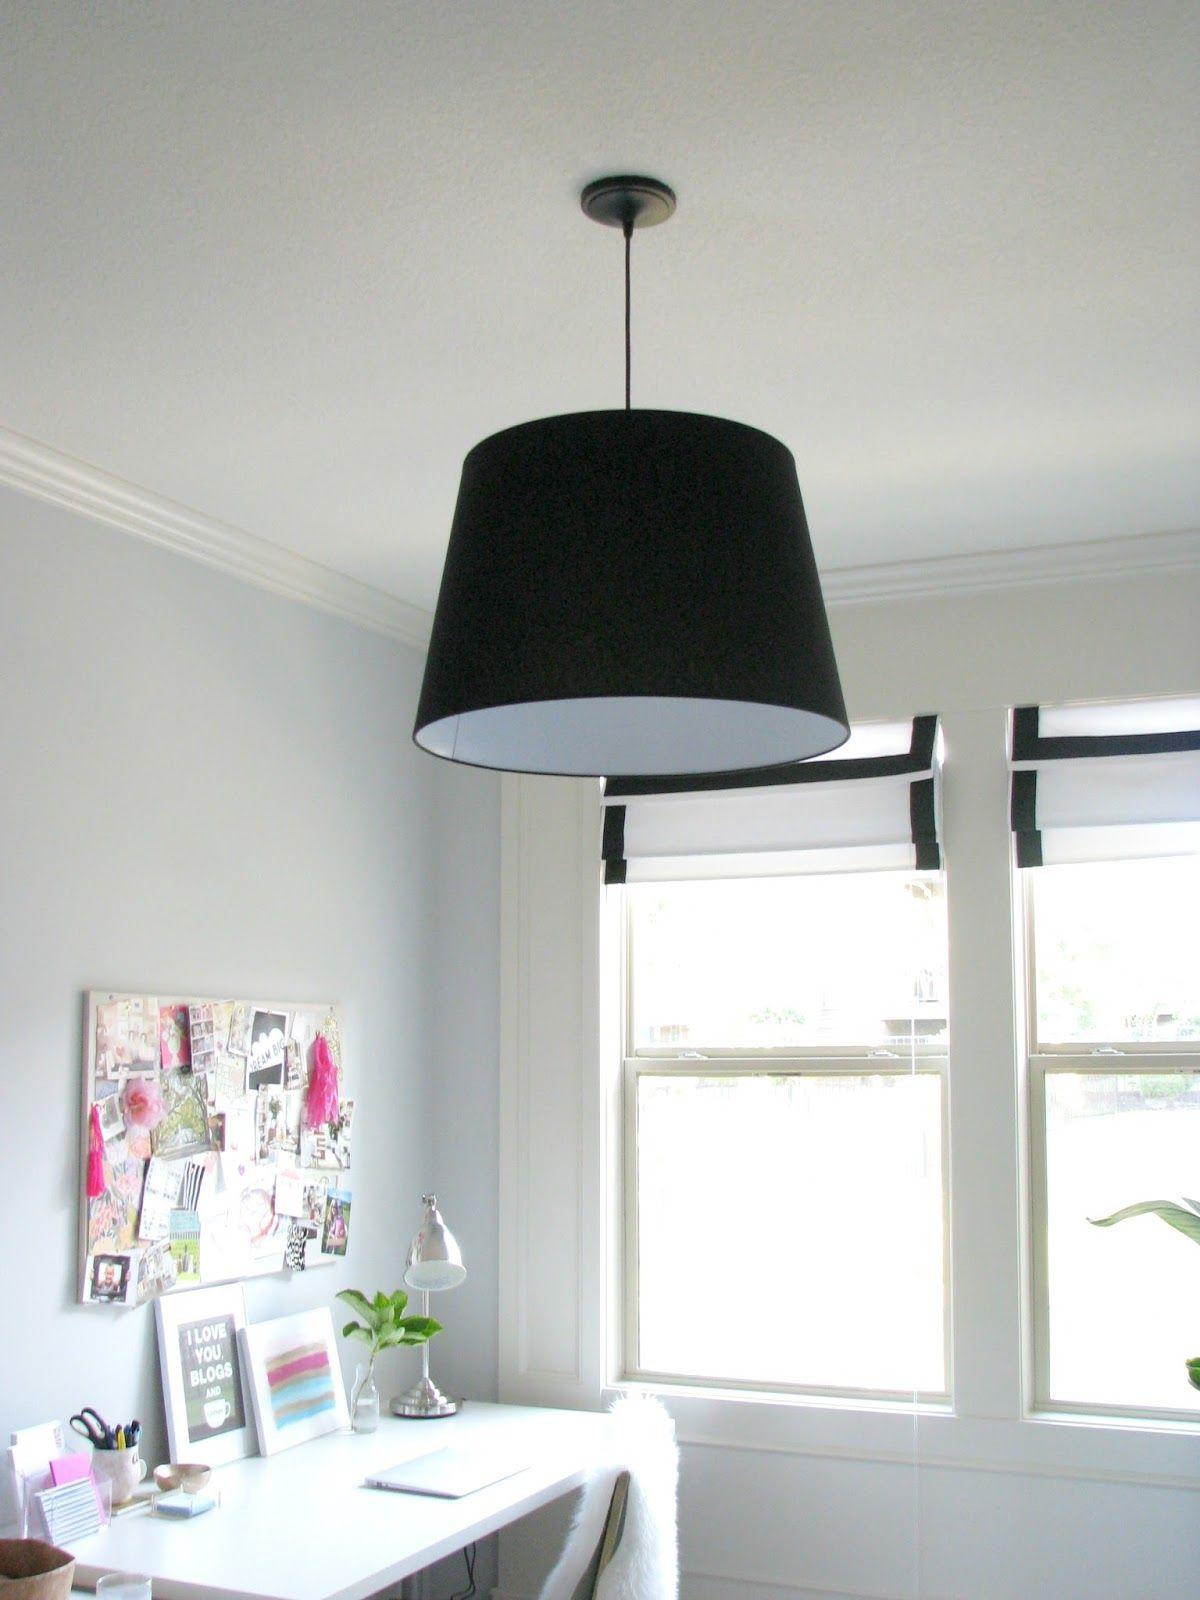 Black JARA Shade from Ikea + pendant light kit from Lowes